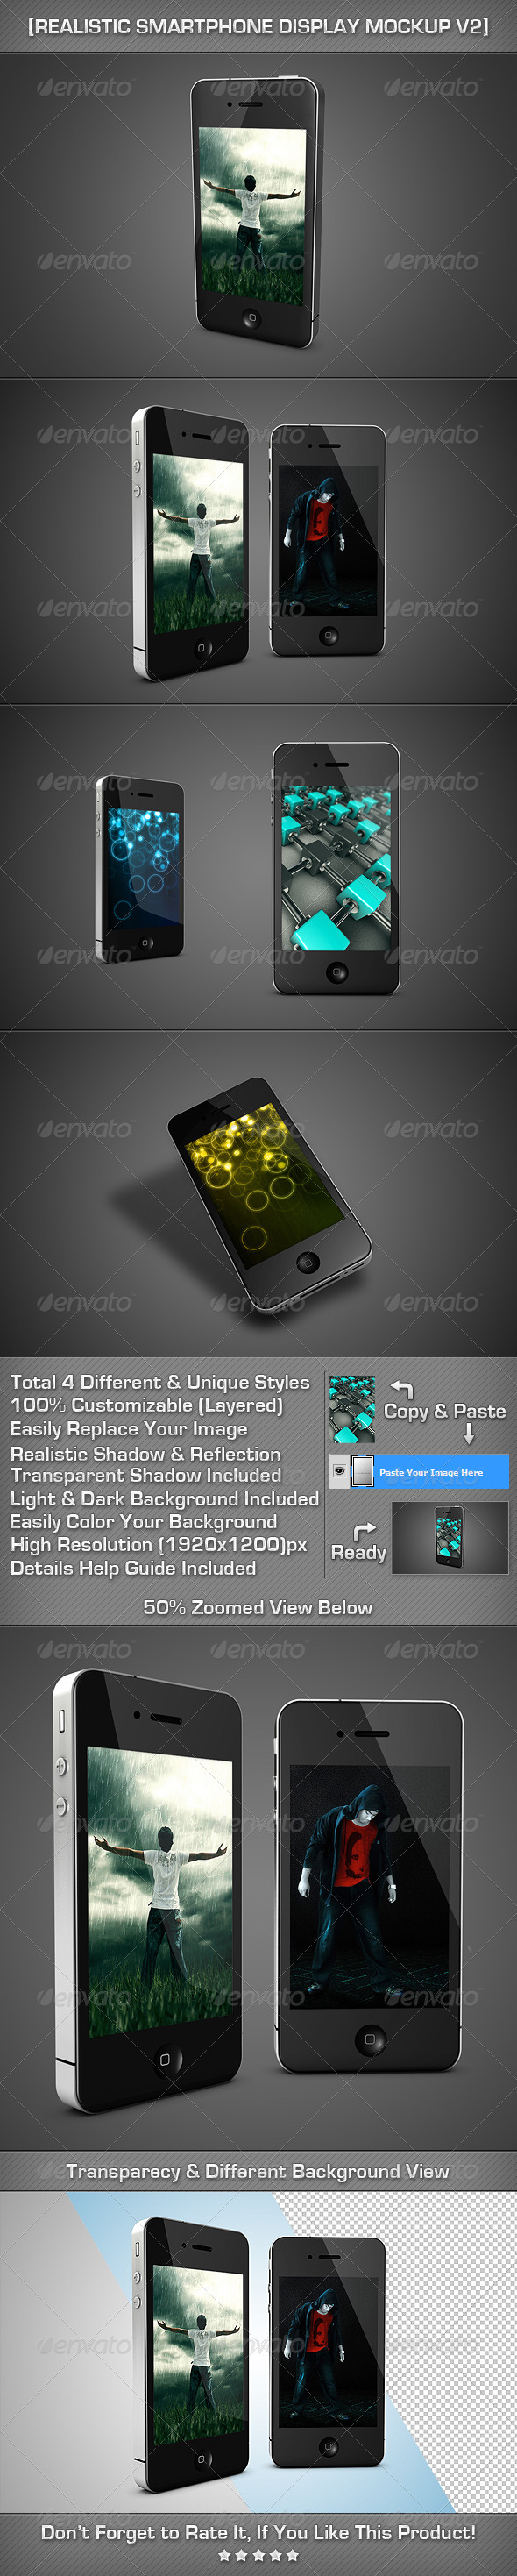 Realistic SmartPhone Display MockUp V2 - Mobile Displays